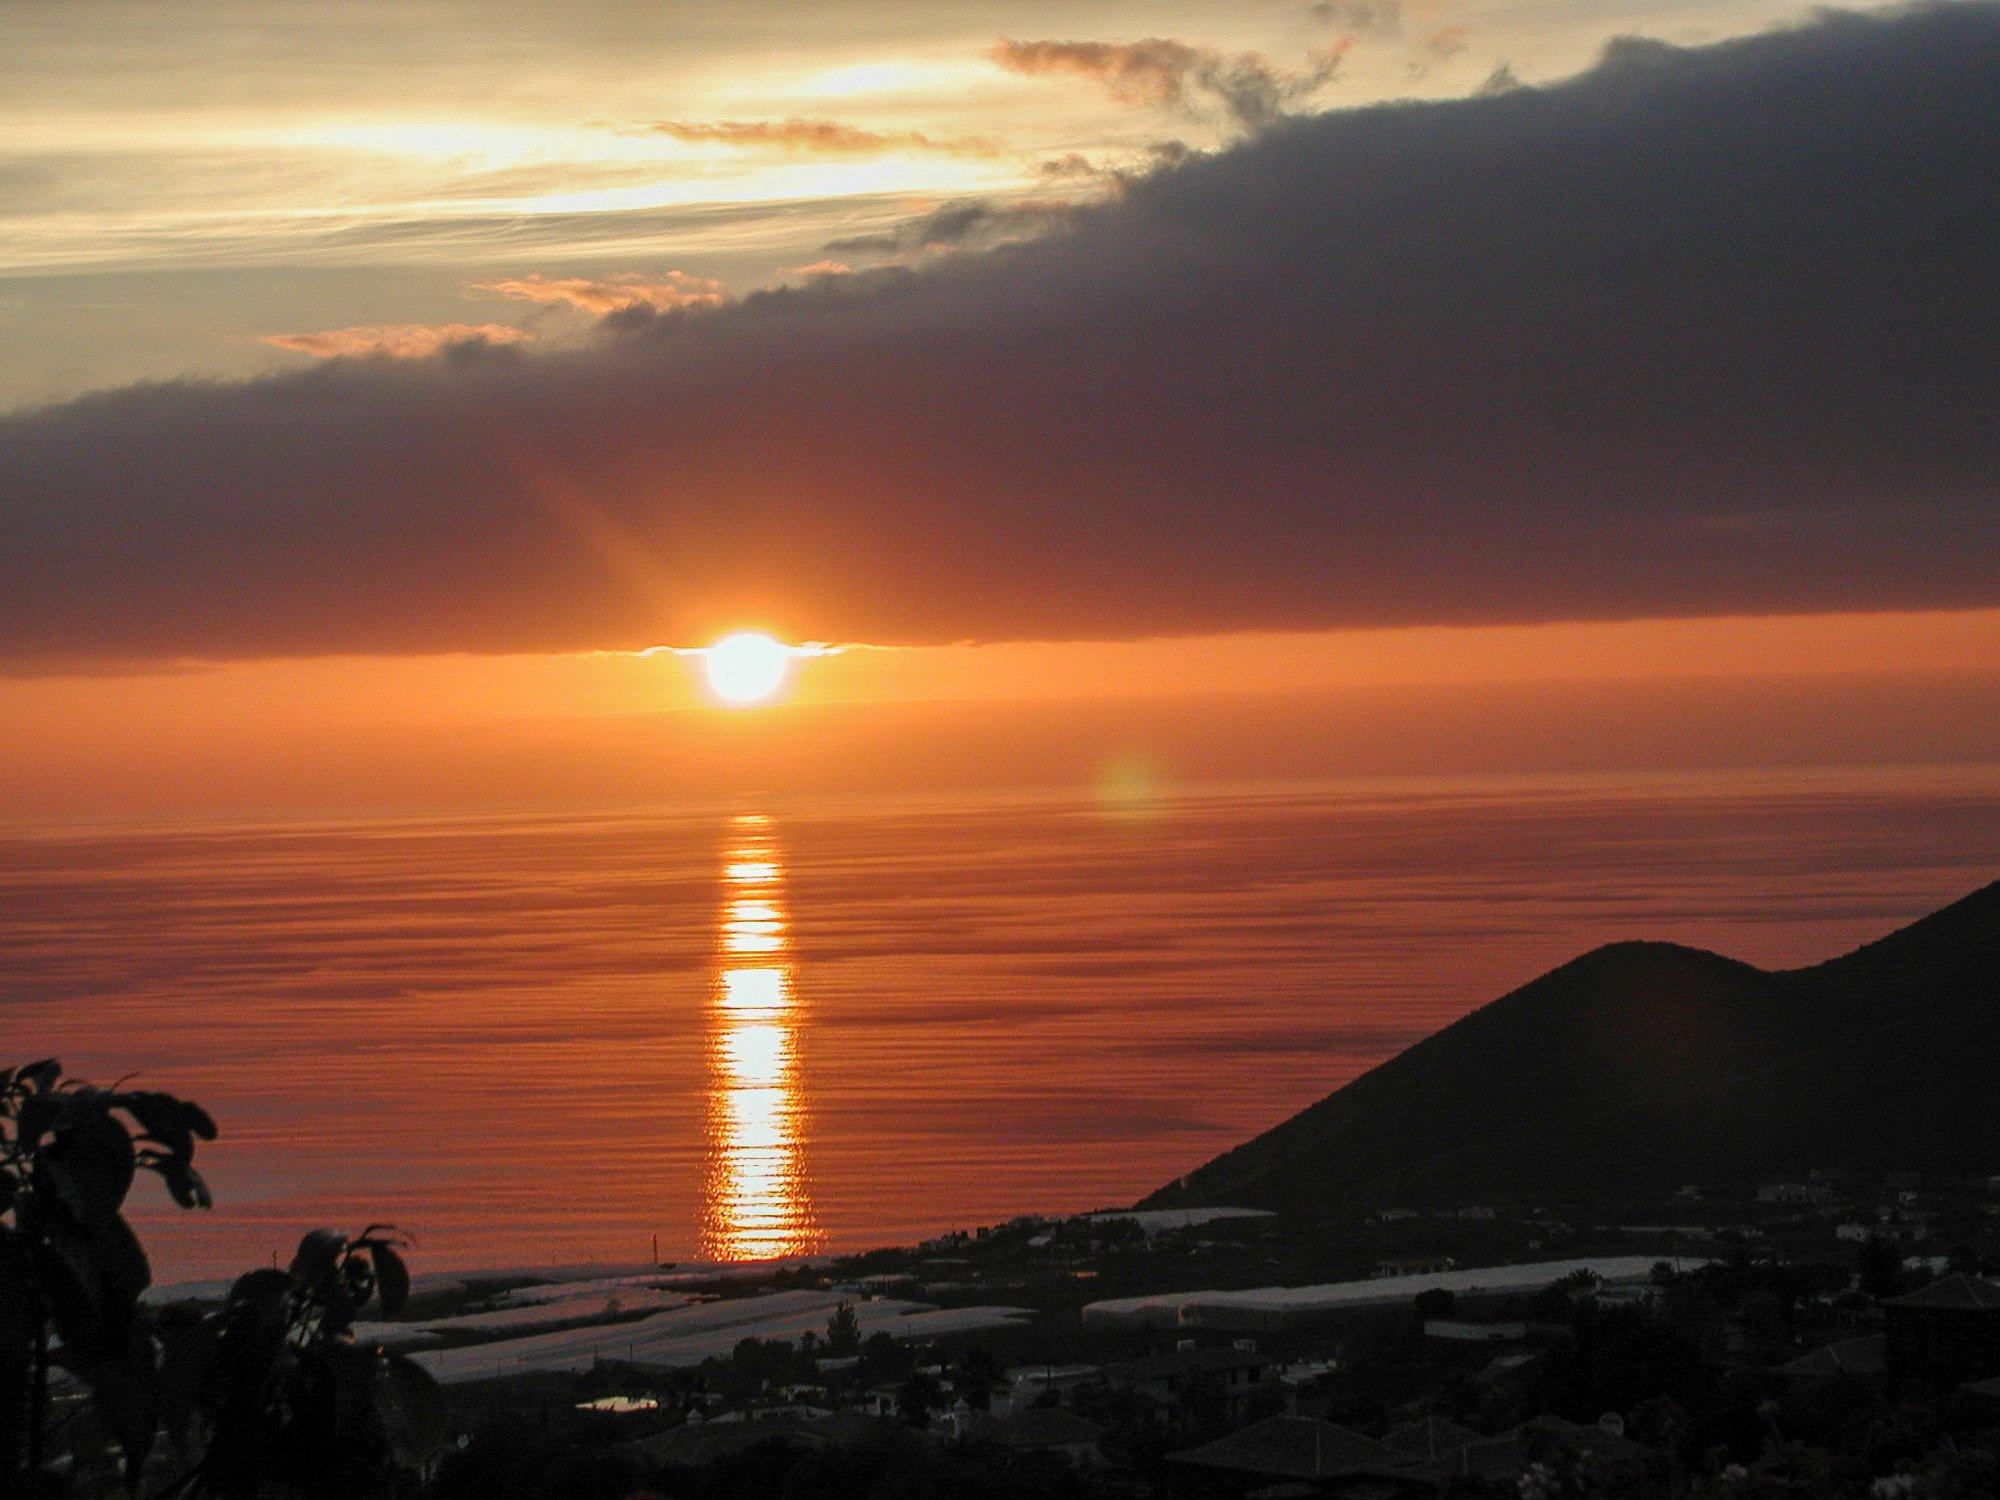 conny doll lifestyle: Sonnenuntergang auf La Palma